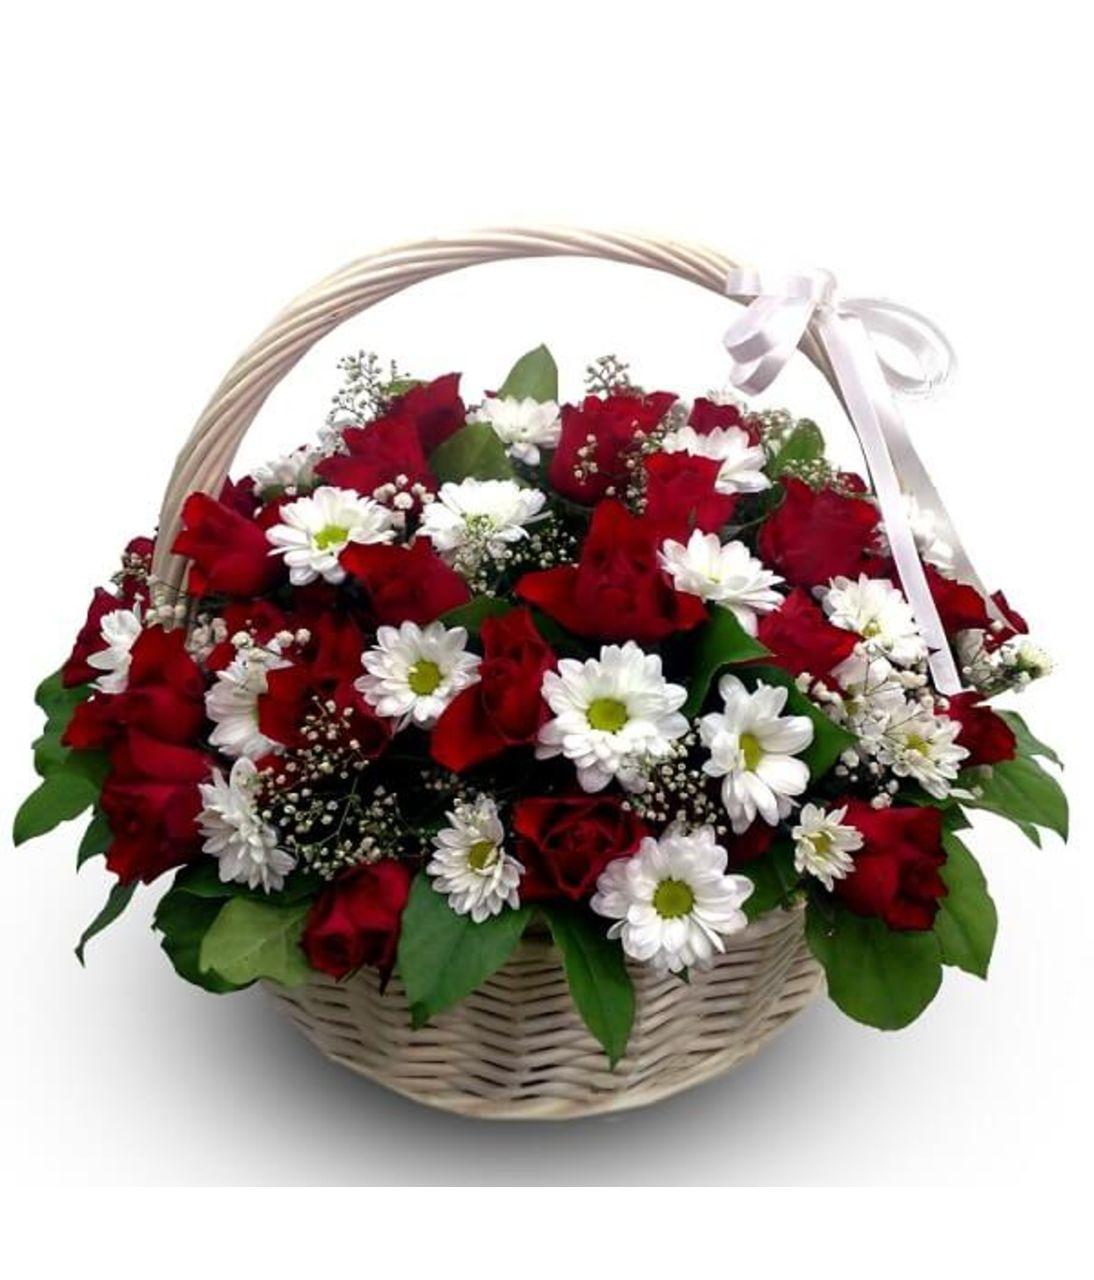 "Кошик квітів ""З любов'ю"". Superflowers.com.ua"